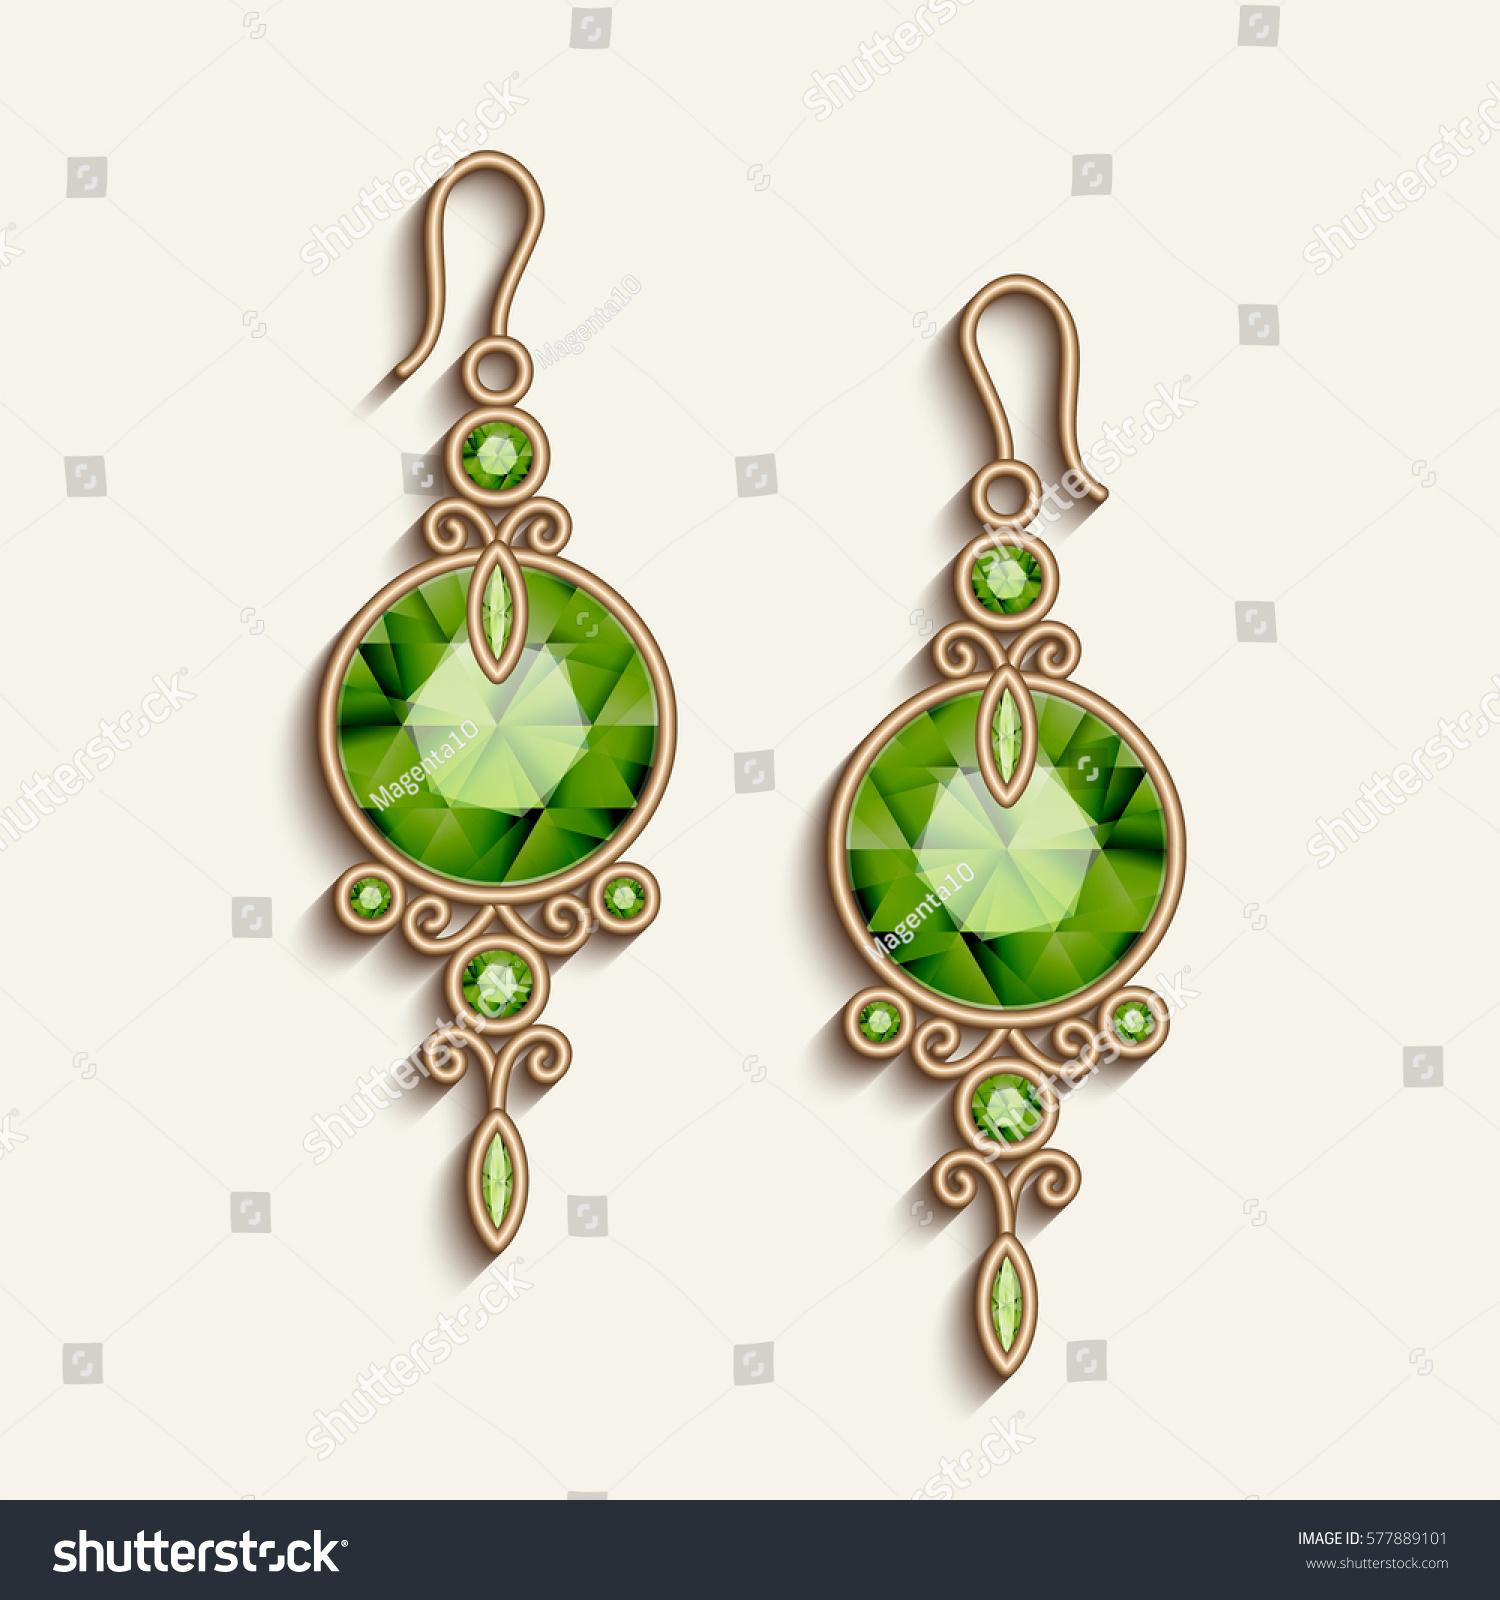 Vintage Gold Jewelry Earrings Green Gemstones Stock Vector